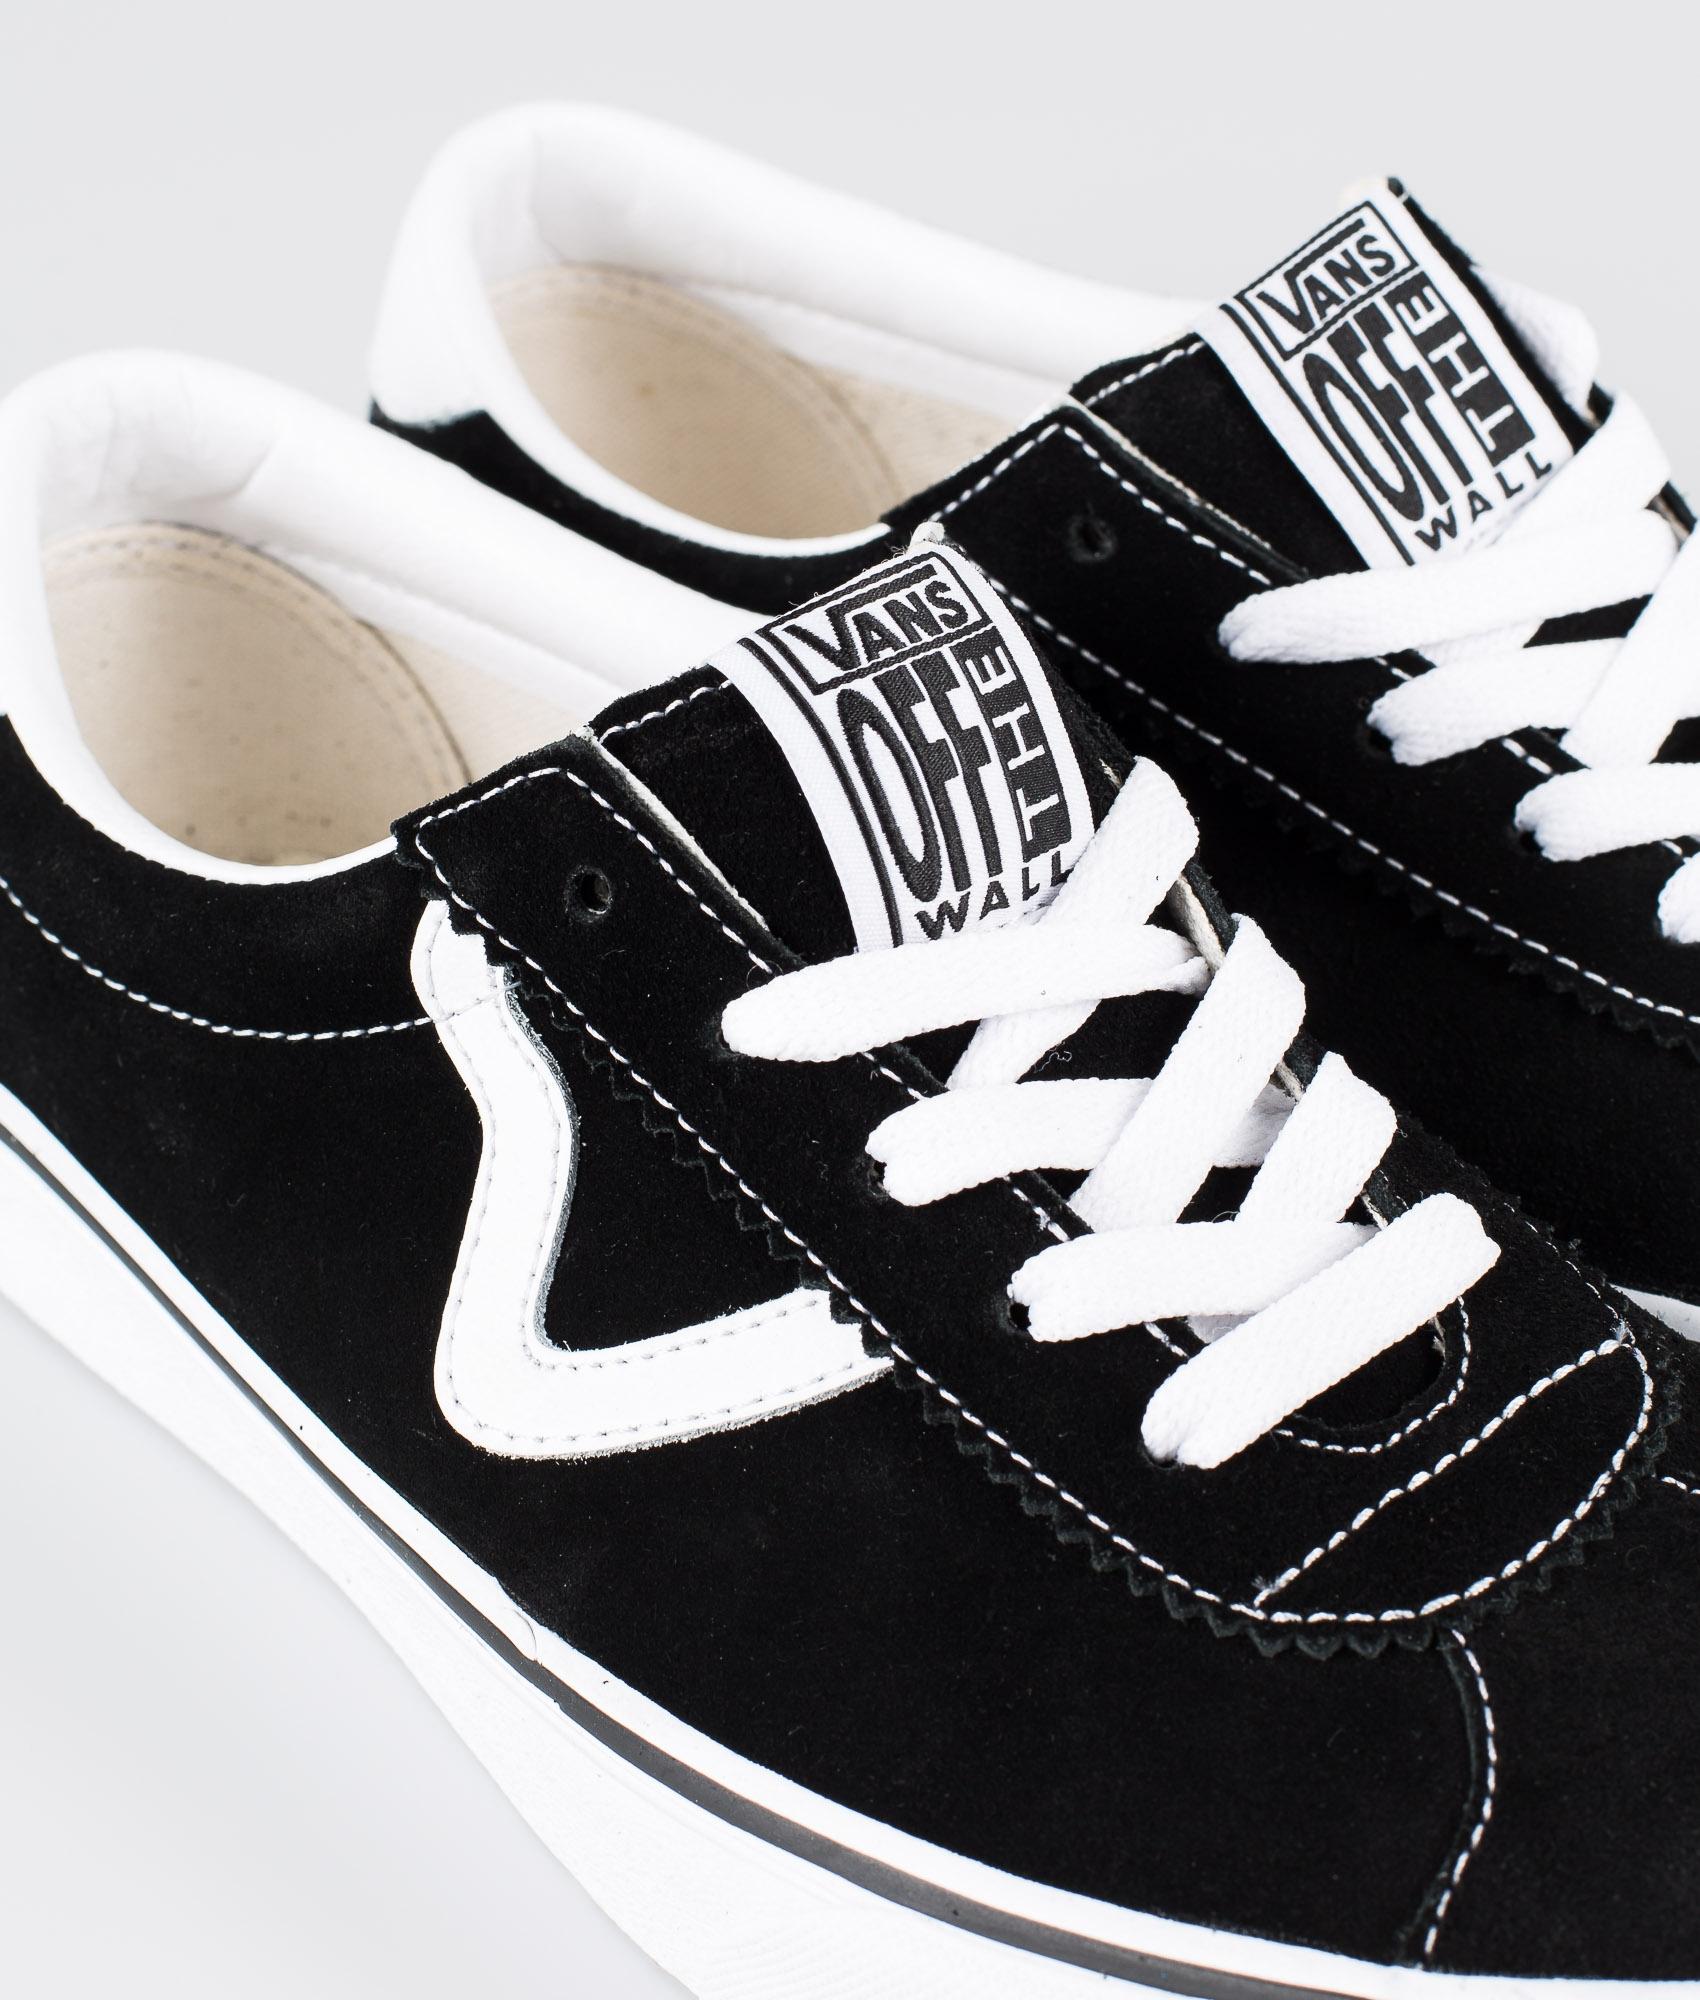 Vans Vans Sport Chaussures (Suede) Black